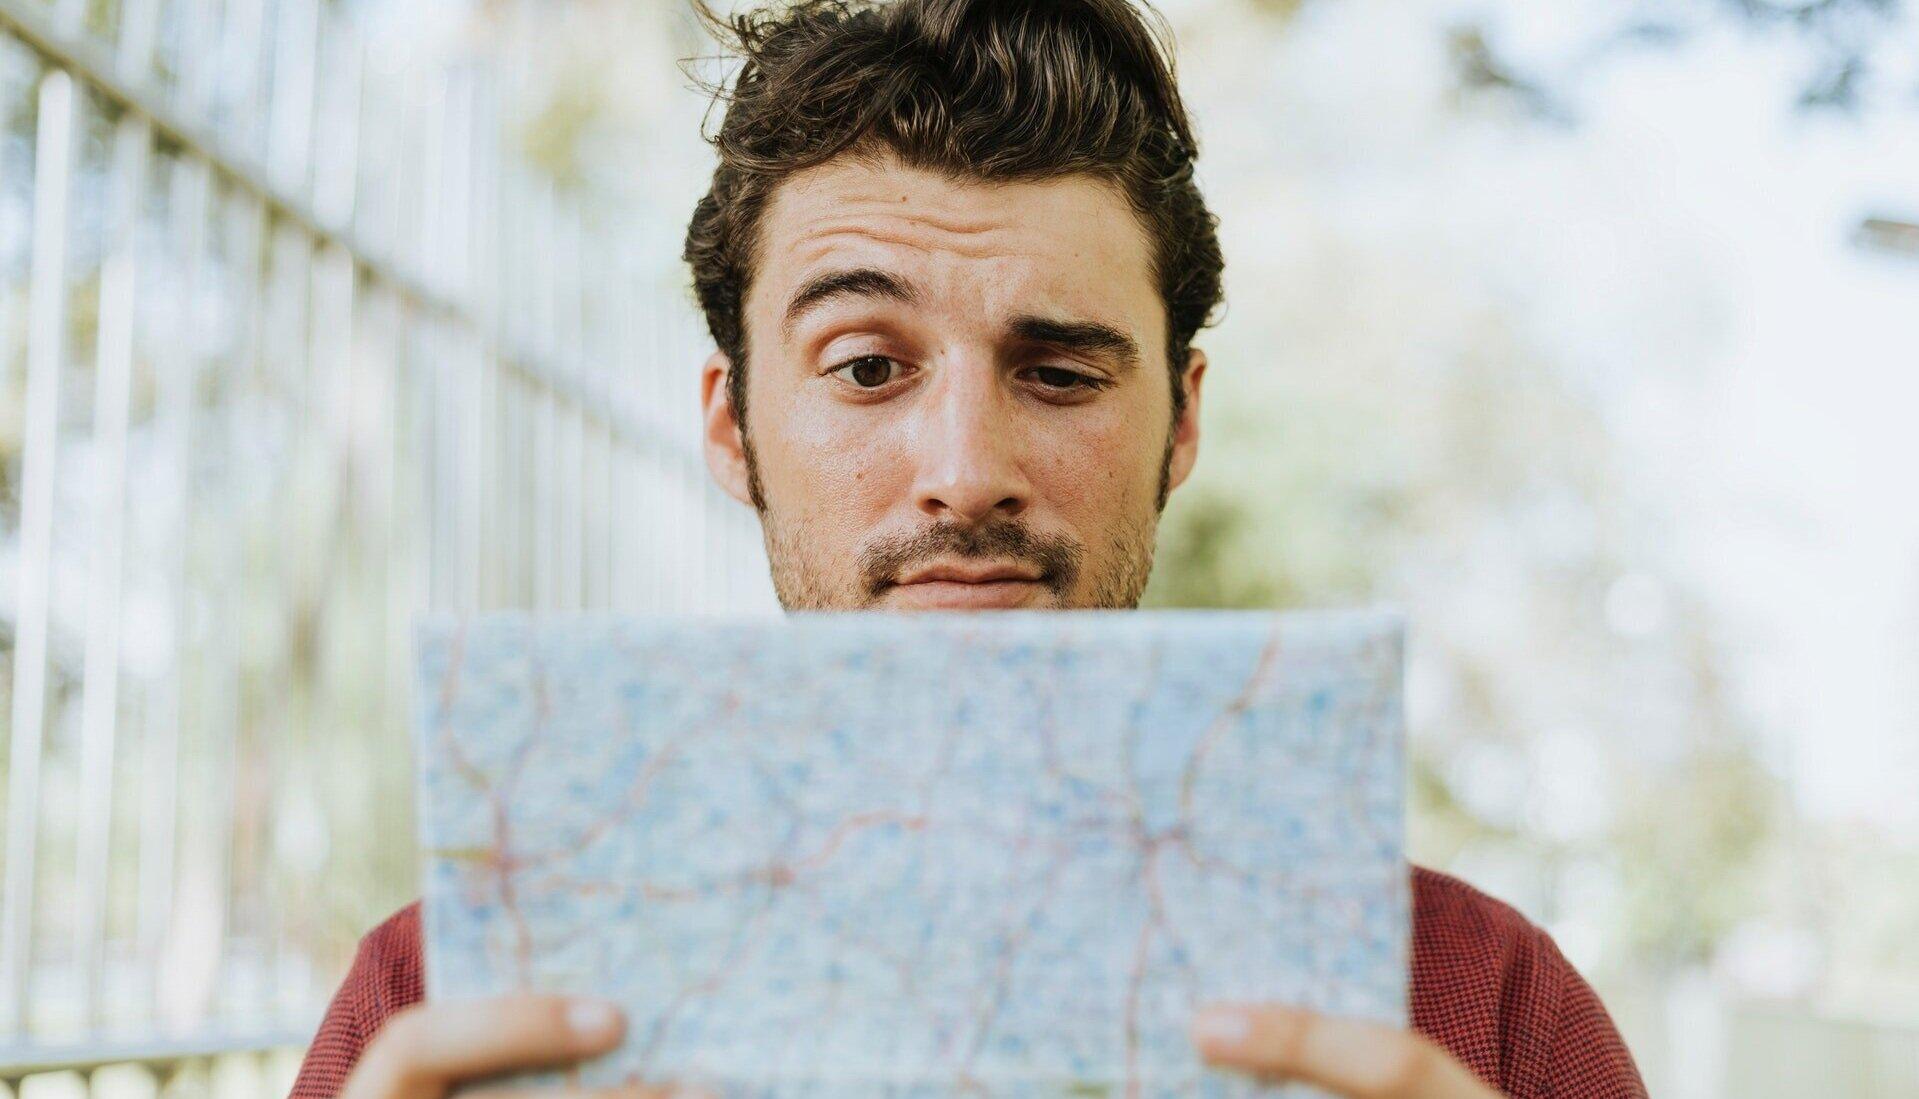 man_checks_map.jpg